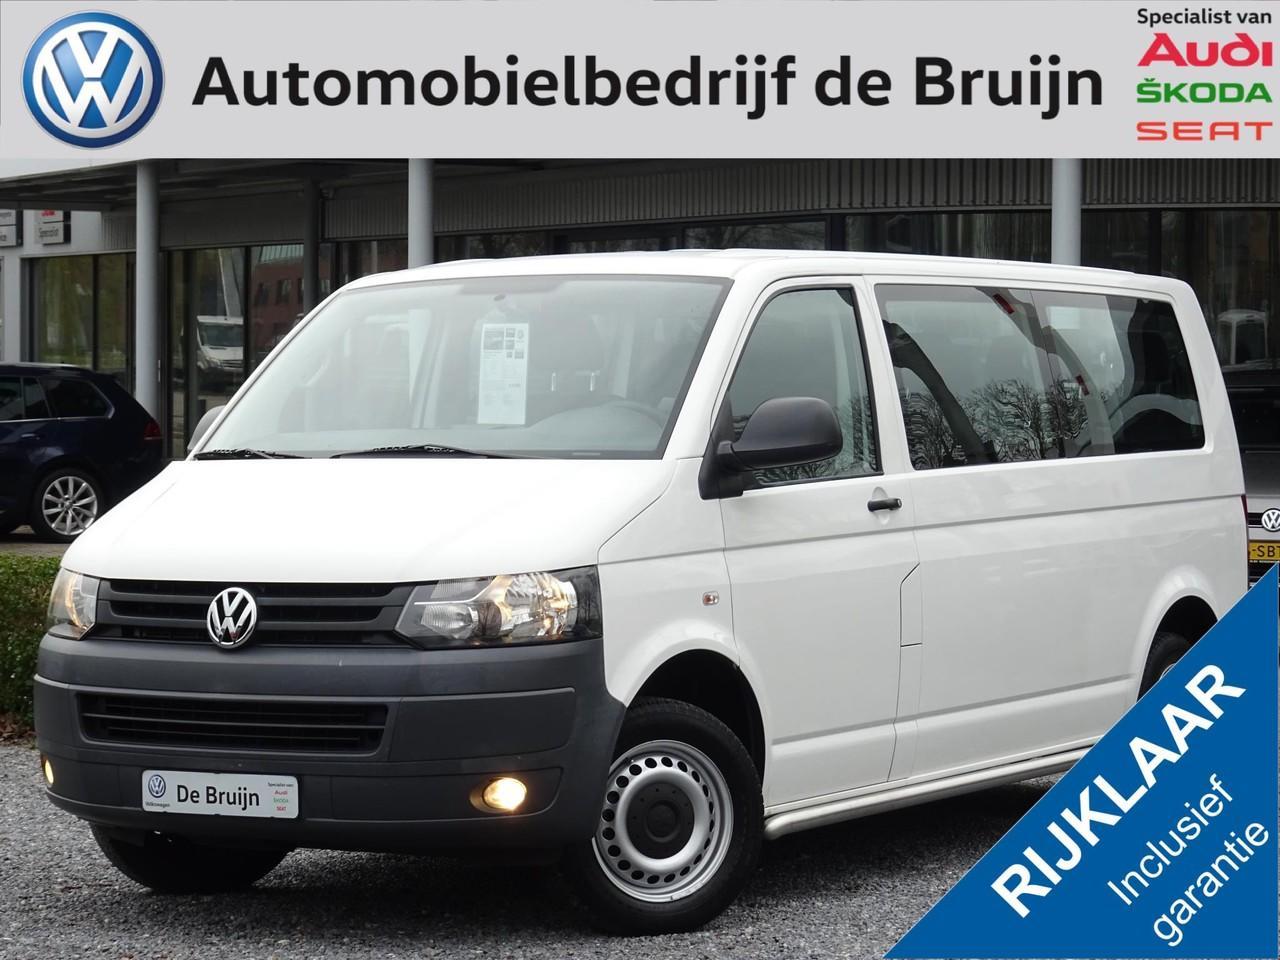 Volkswagen Transporter Kombi 2.0 tdi lwb 9p (bpm vrij,cruise,airco)